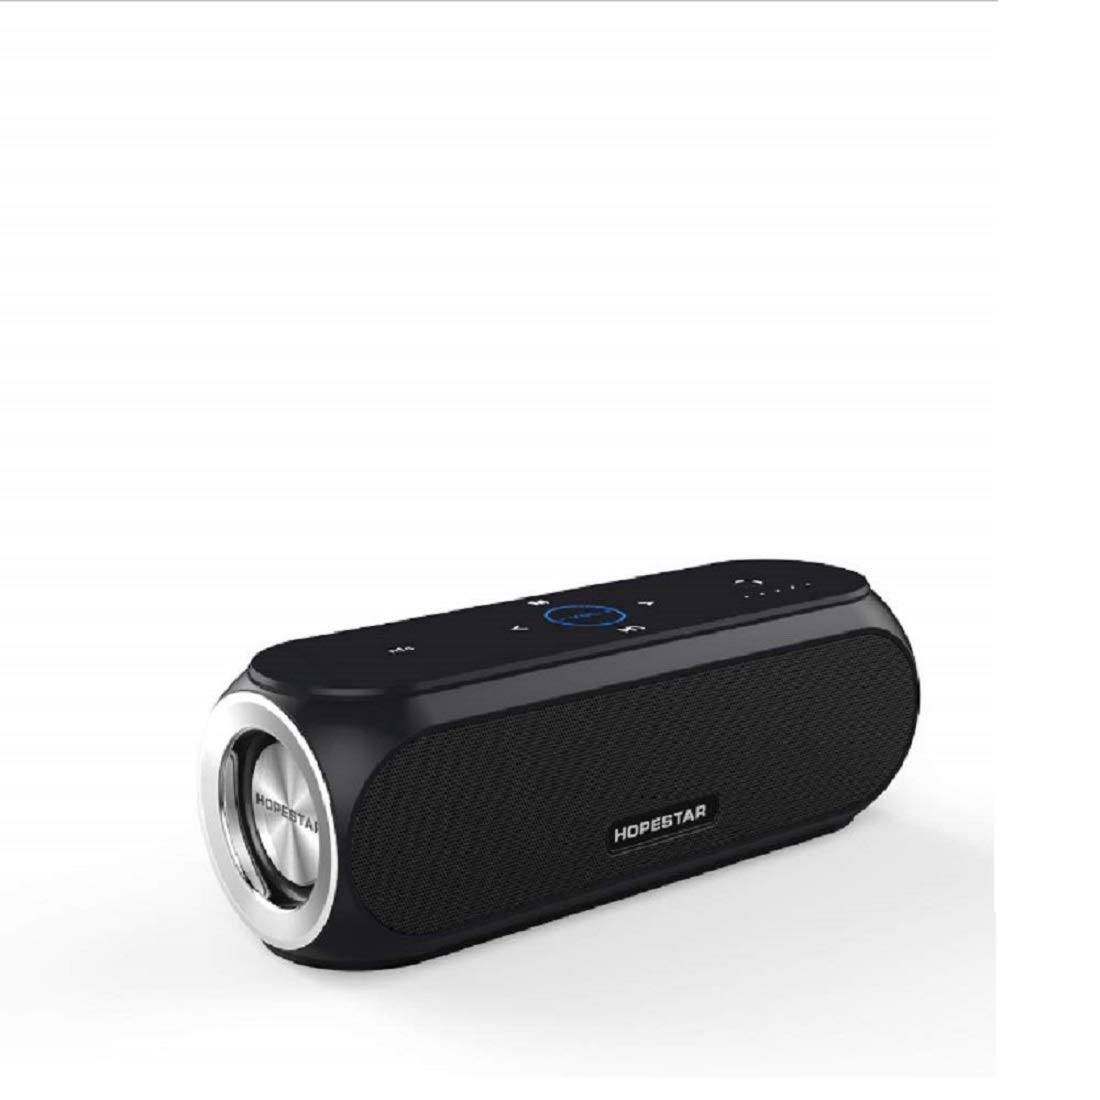 VINCEN スピーカー、ワイヤレススピーカー、ハンズフリーの聴覚、ステレオサウンドFM ポータブルモバイルパワー Bluetoothスピーカー   B07JHNRQR4